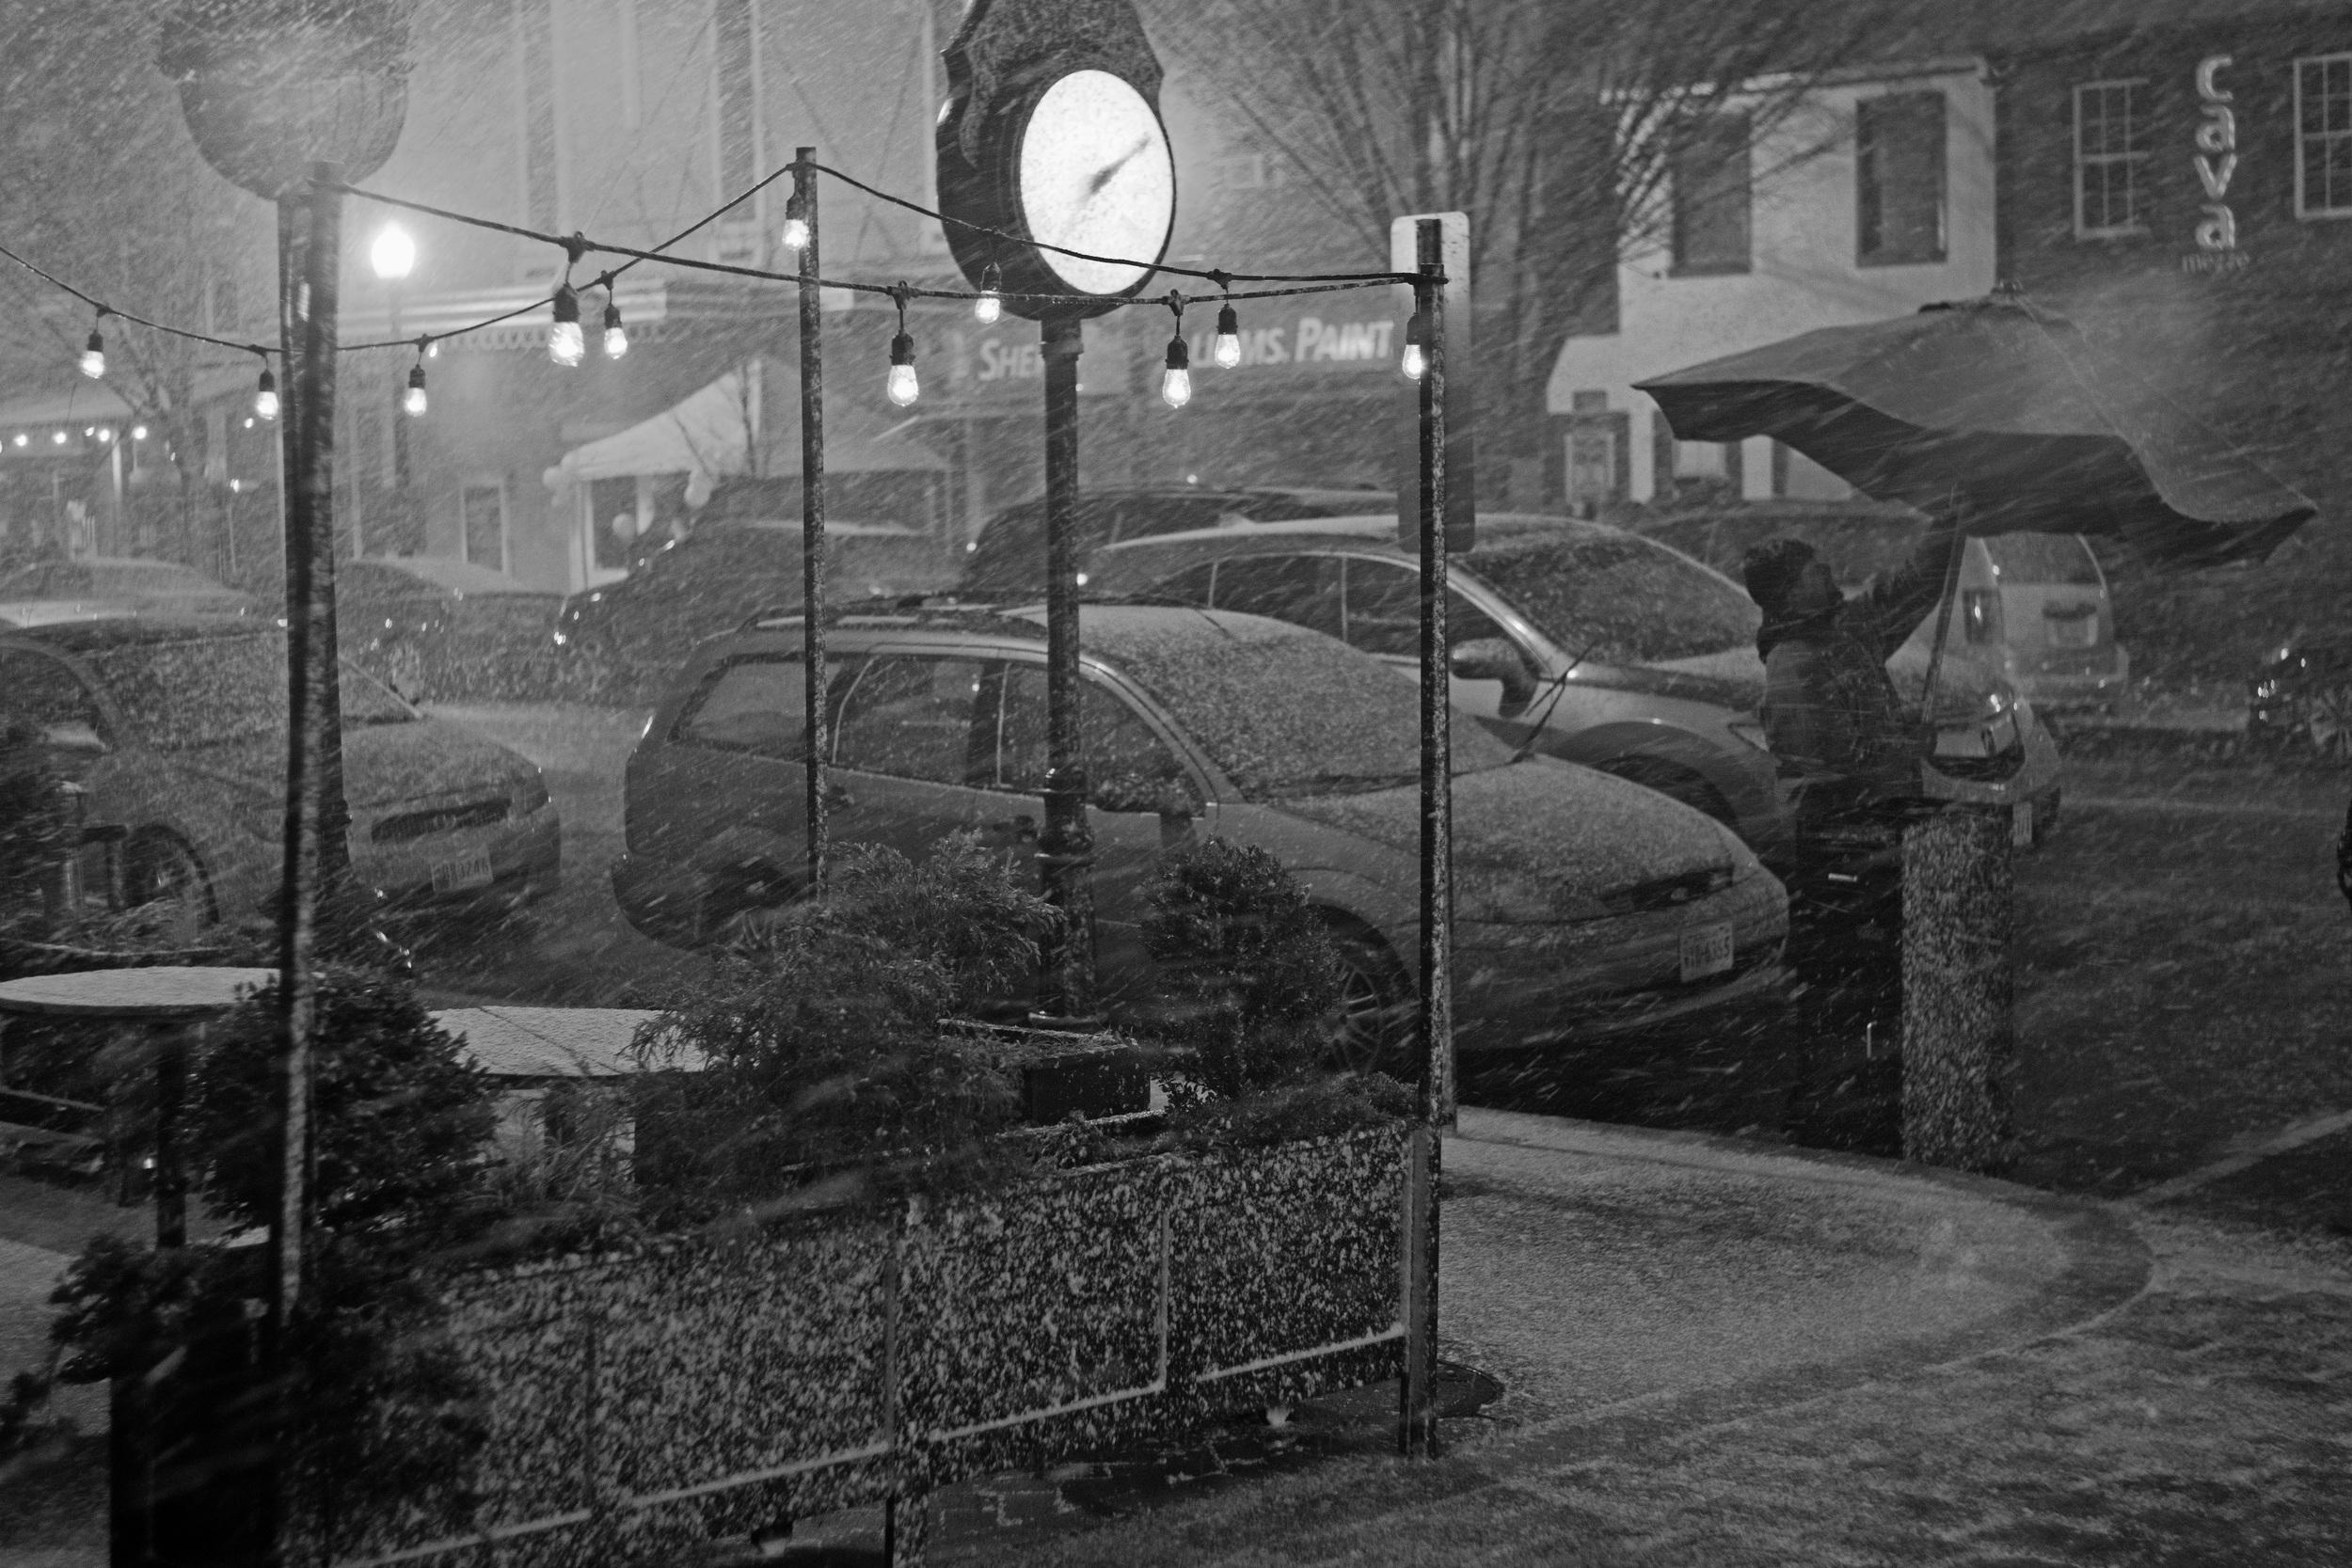 Eastern Market/Barracks Row neighborhood, Washington, DC. February 14, 2015.